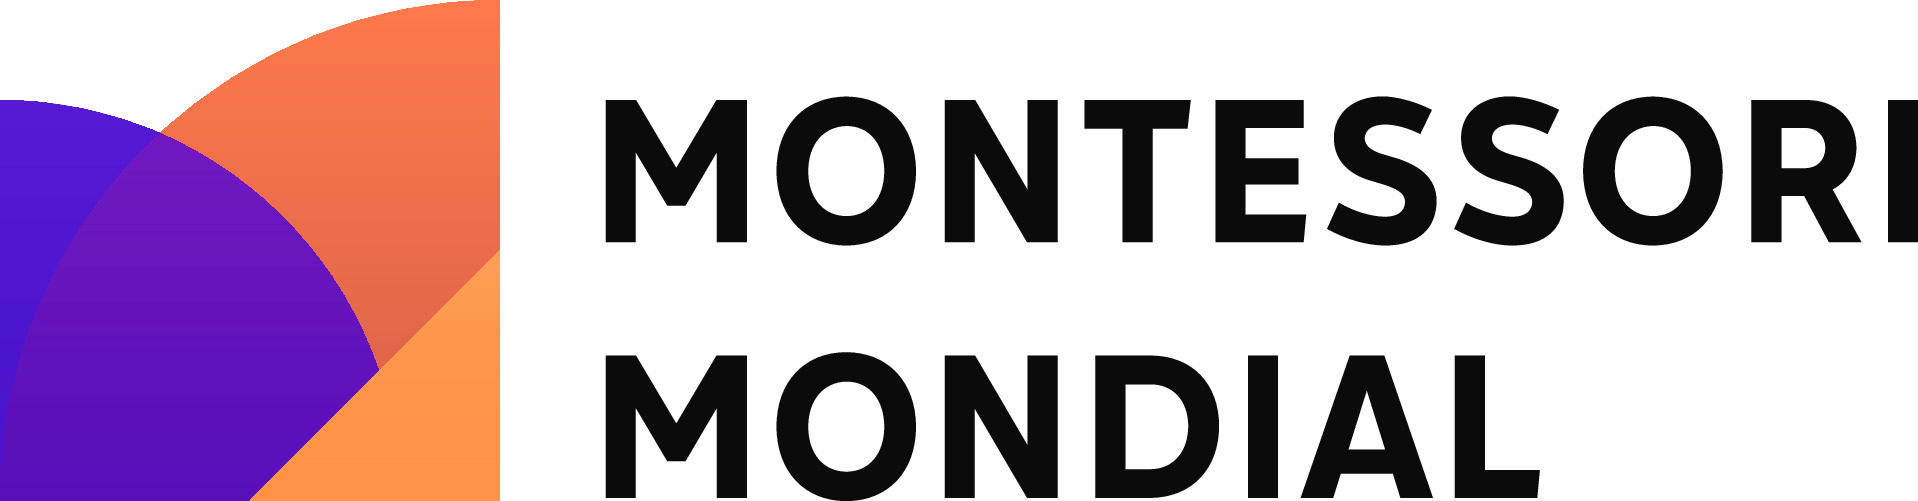 Montessori Mondial